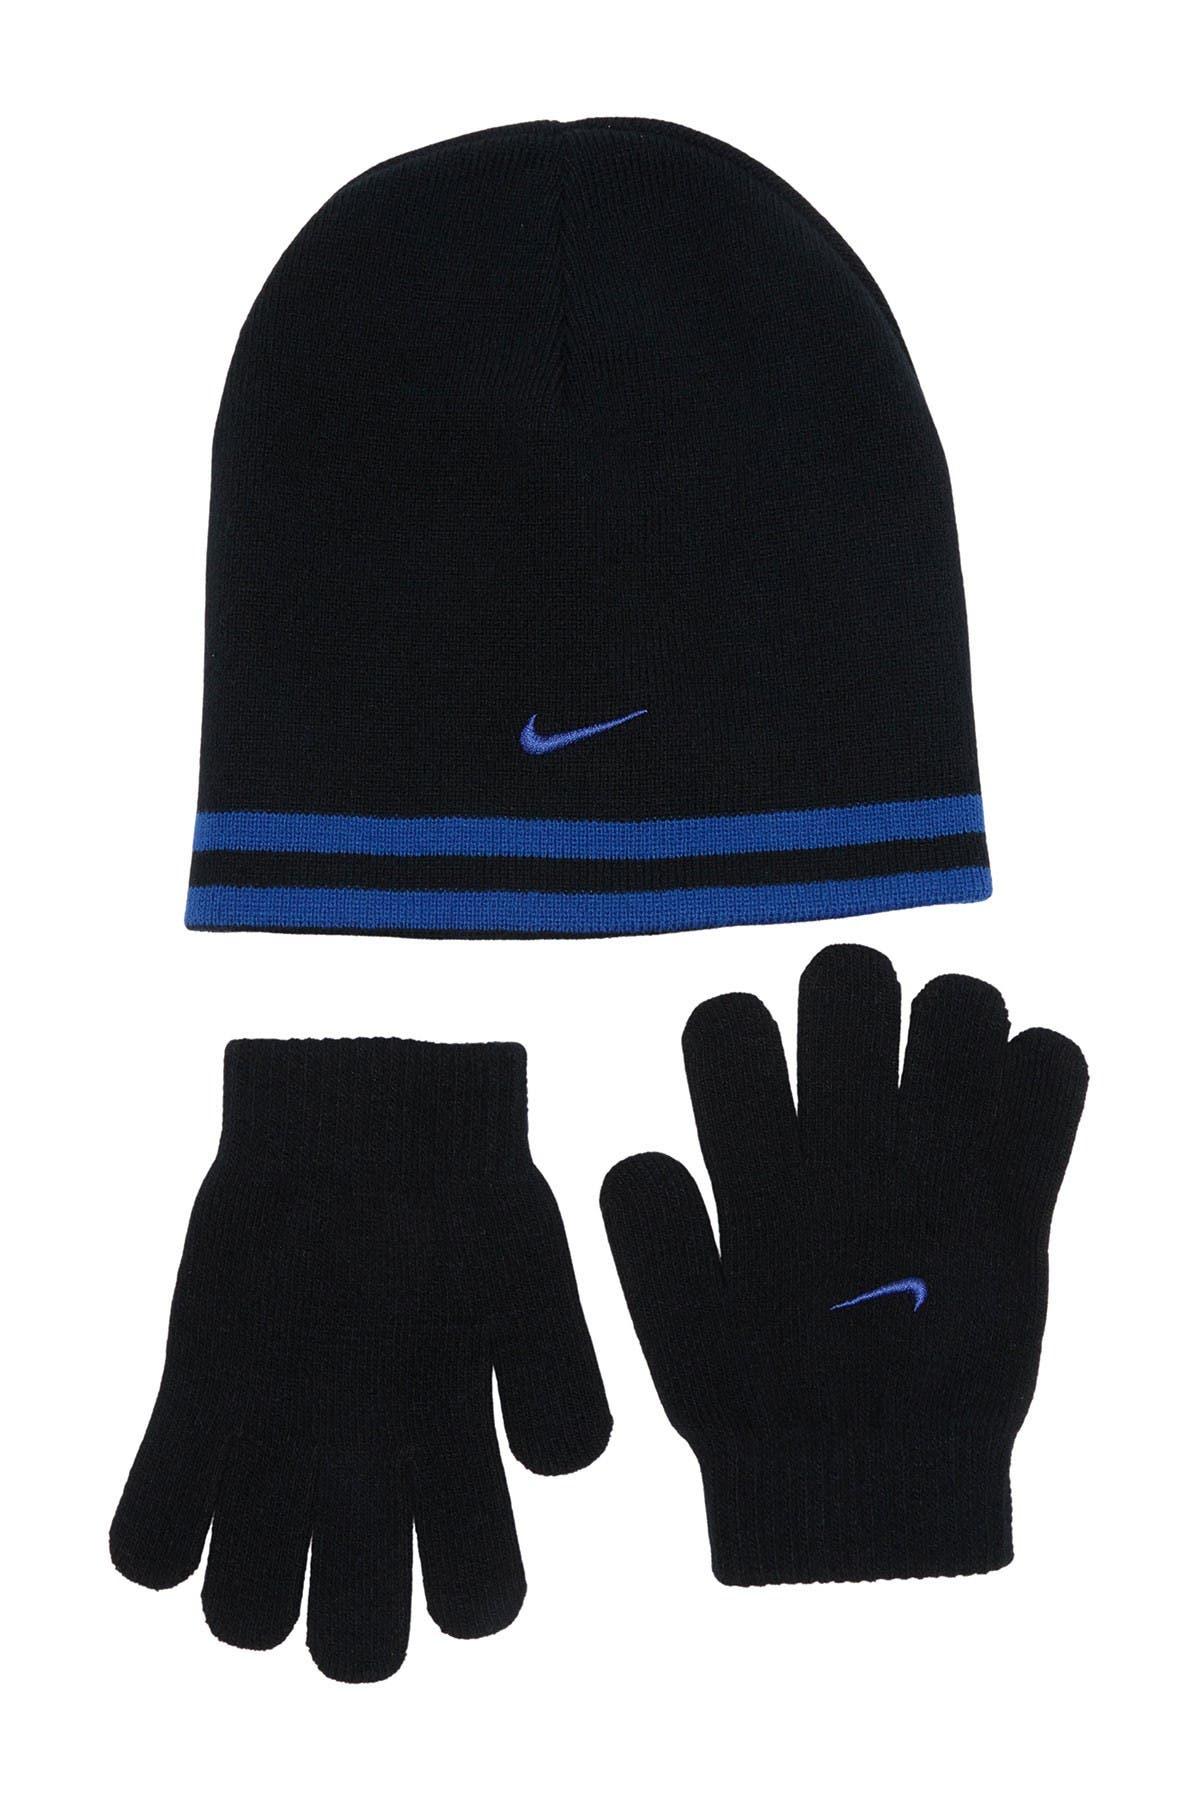 Image of NIKE SB Reverse Strip Gloves & Beanie Set